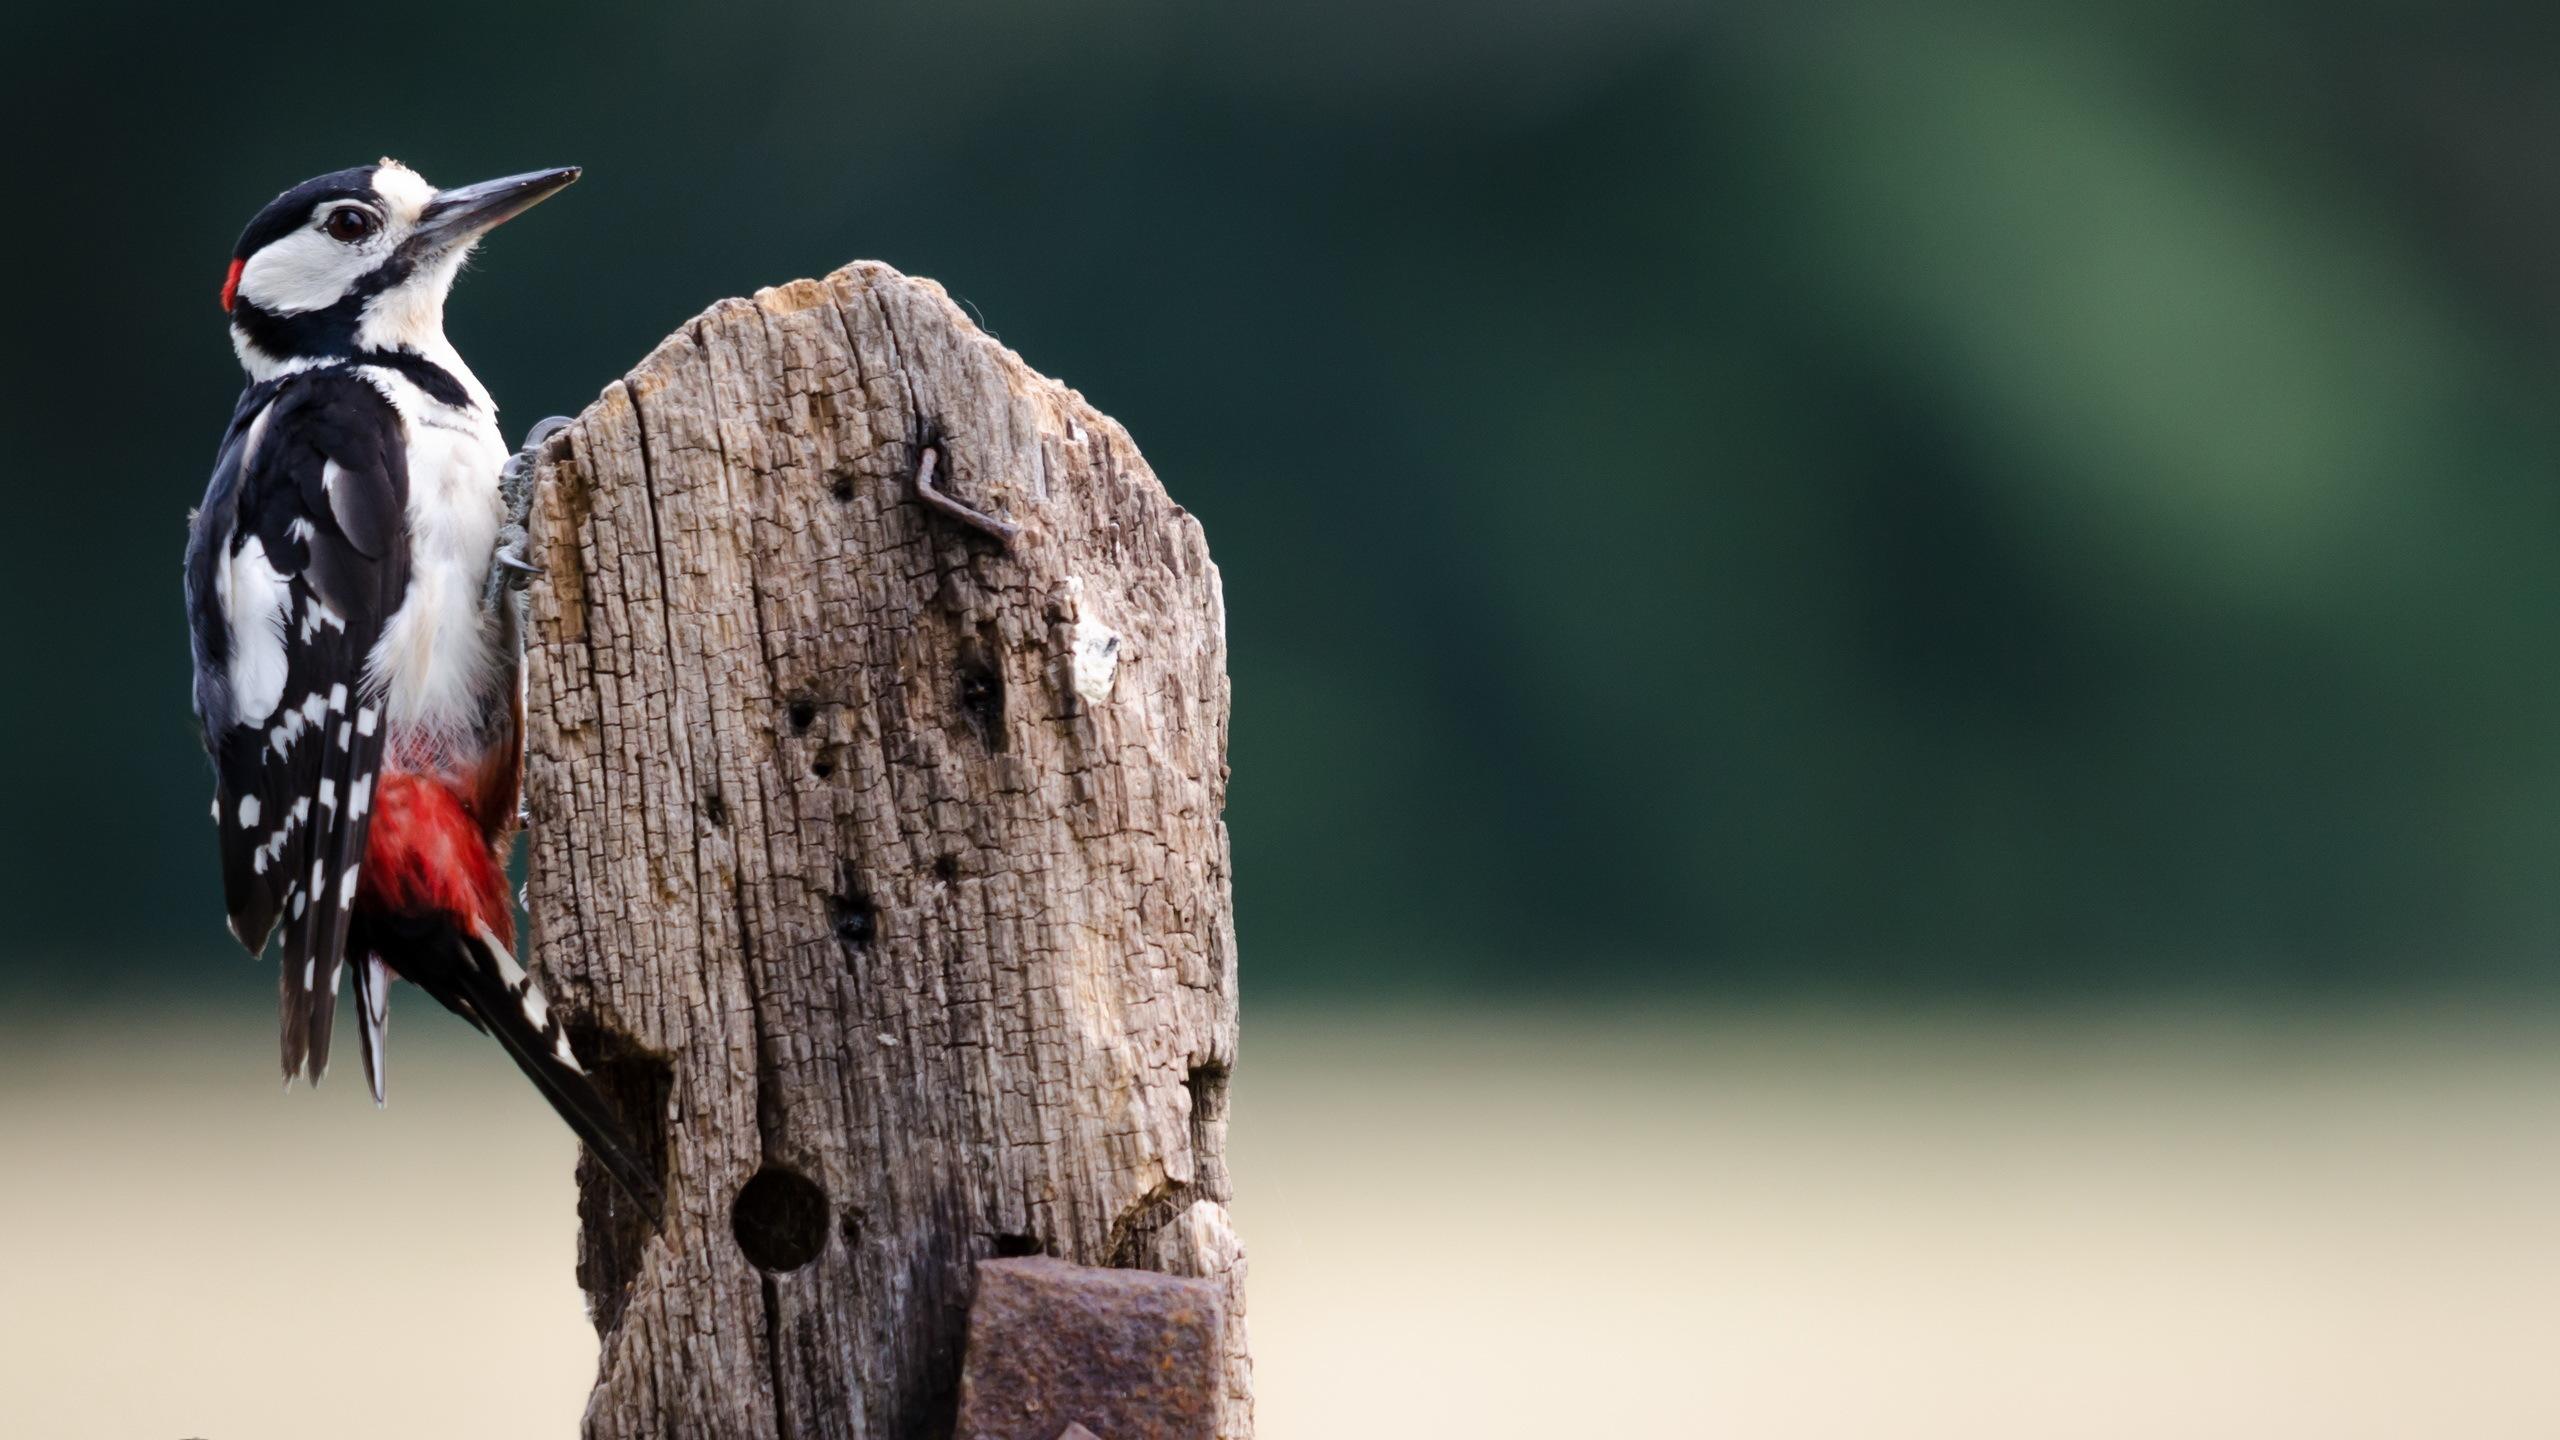 Image: Bird, woodpecker, tree, sitting, blurred background, looks